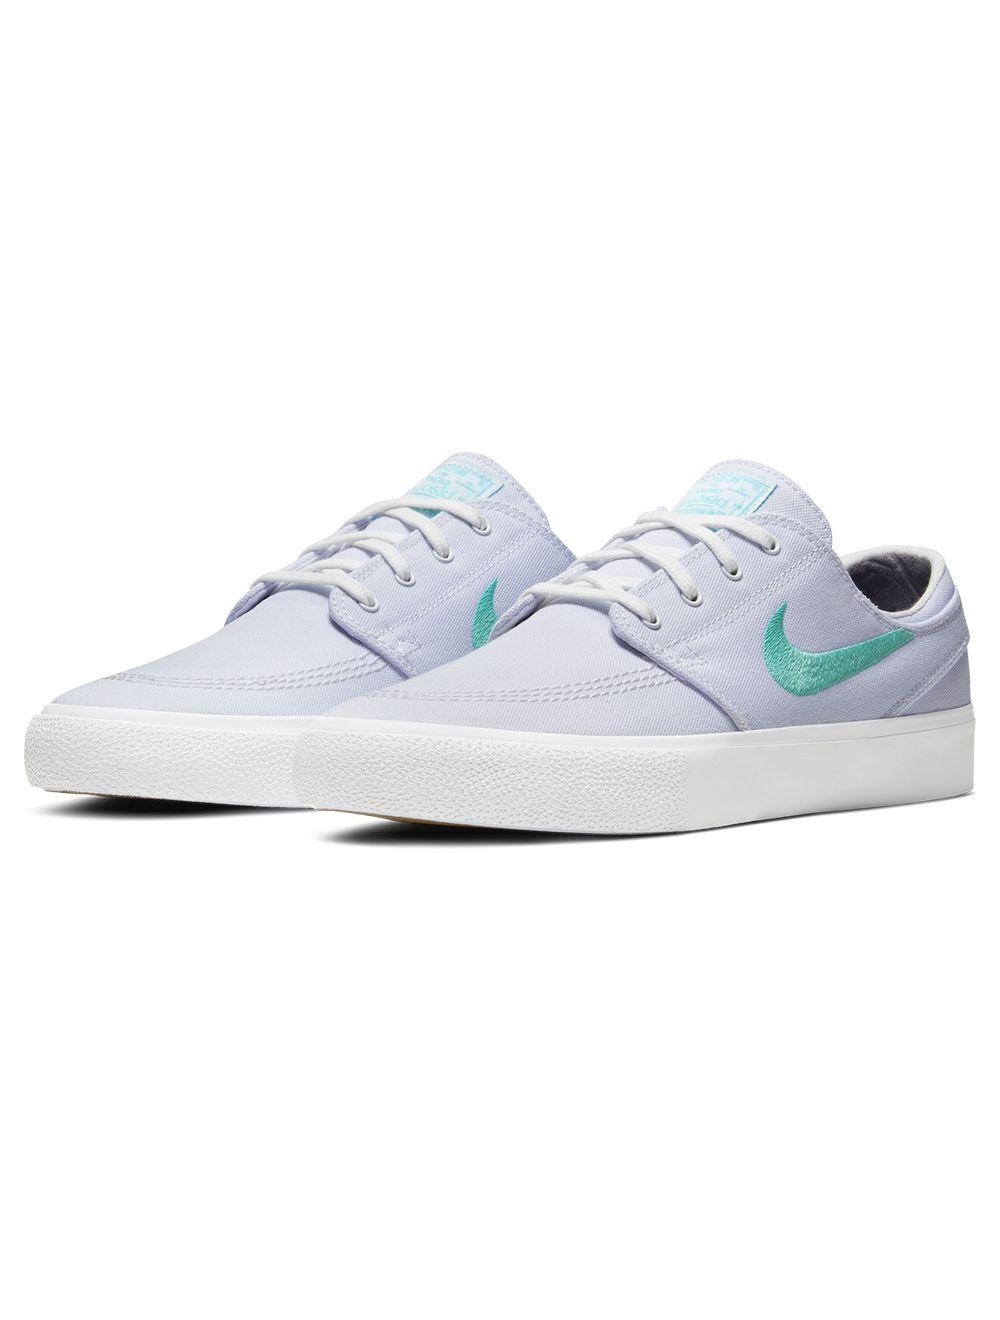 Nike SB. Zoom Janoski Canvas RM. White/Tropical Twist/White.